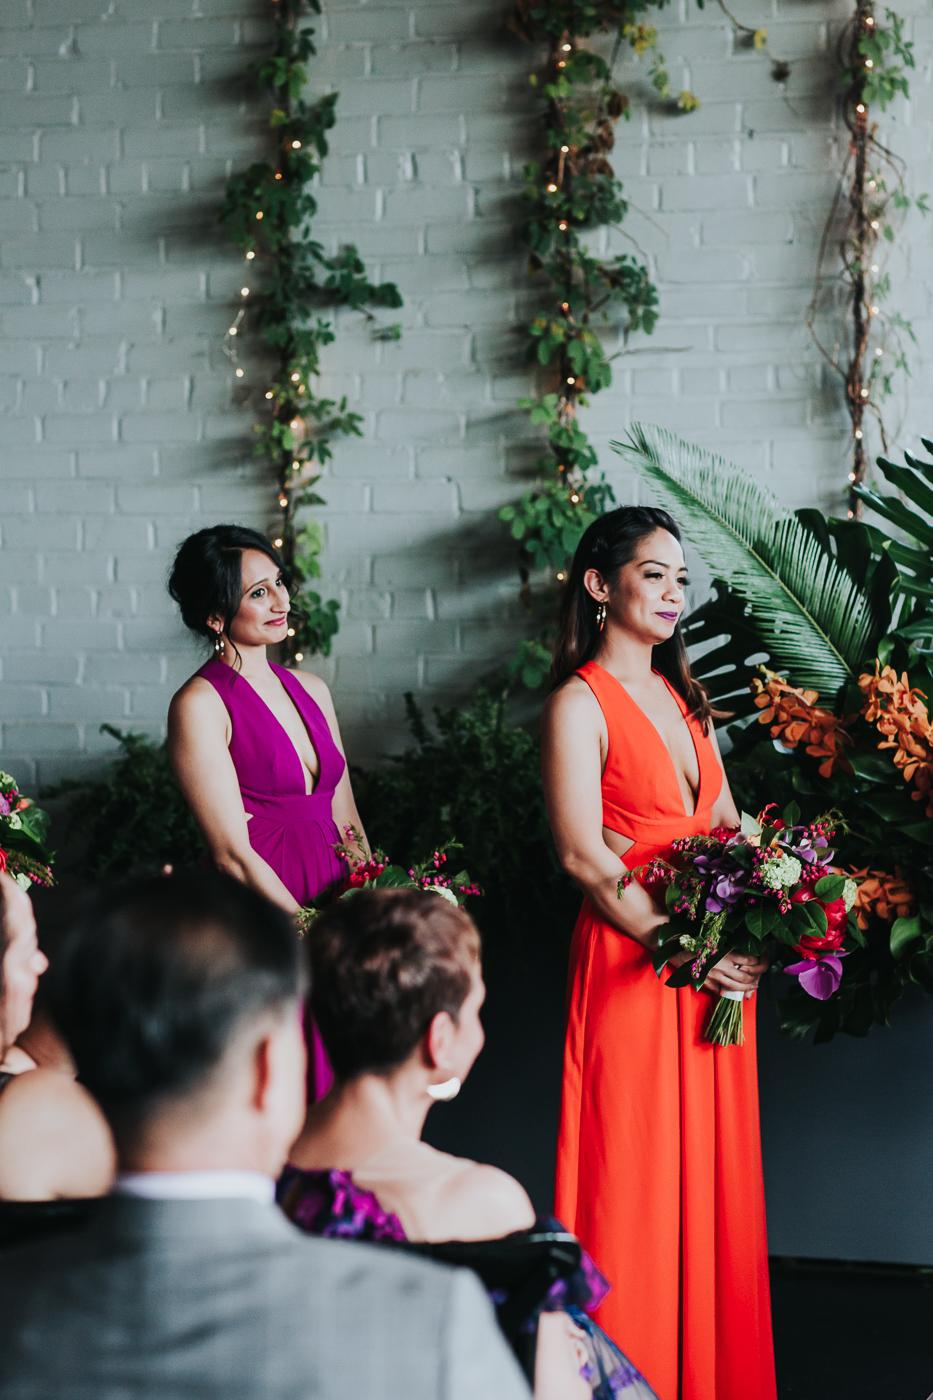 501-Union-Brooklyn-Documentary-Wedding-Photographer-76.jpg